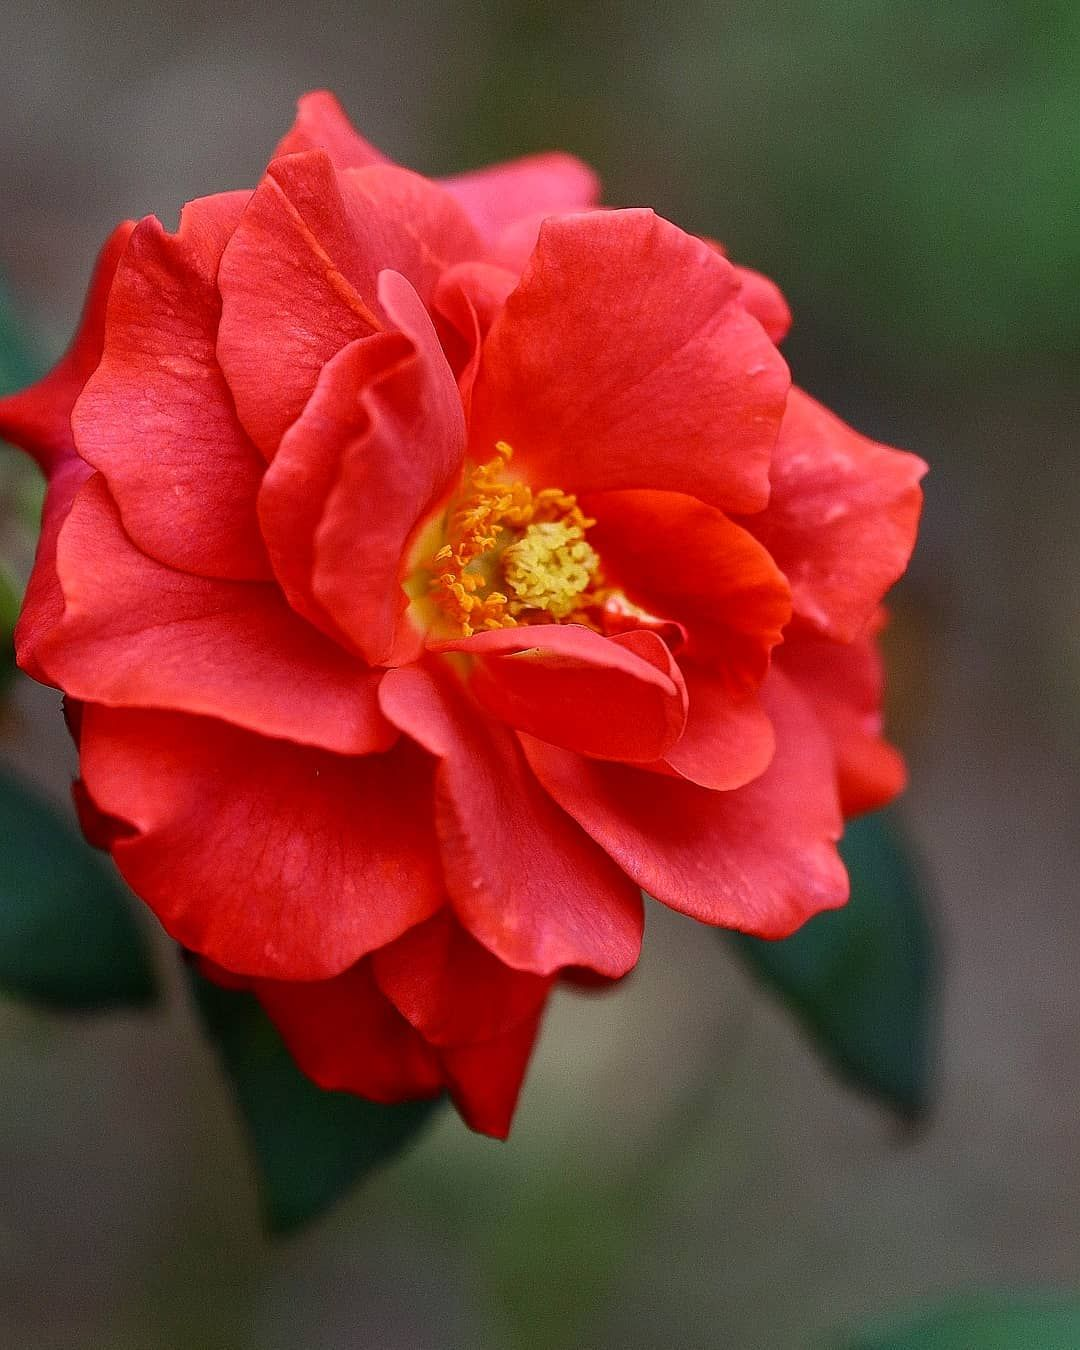 "meiko🦋風花🦋 on Instagram: ""🦋🌹🌸🌺🌼🌻☘️🦋🌹🌸 . #9vaga_rose9 #flower_igers #9vaga_flowersart9 #9vaga_3flowers9 #picc_roses #healing_roses_ #gw_roses #lory_roses…"""